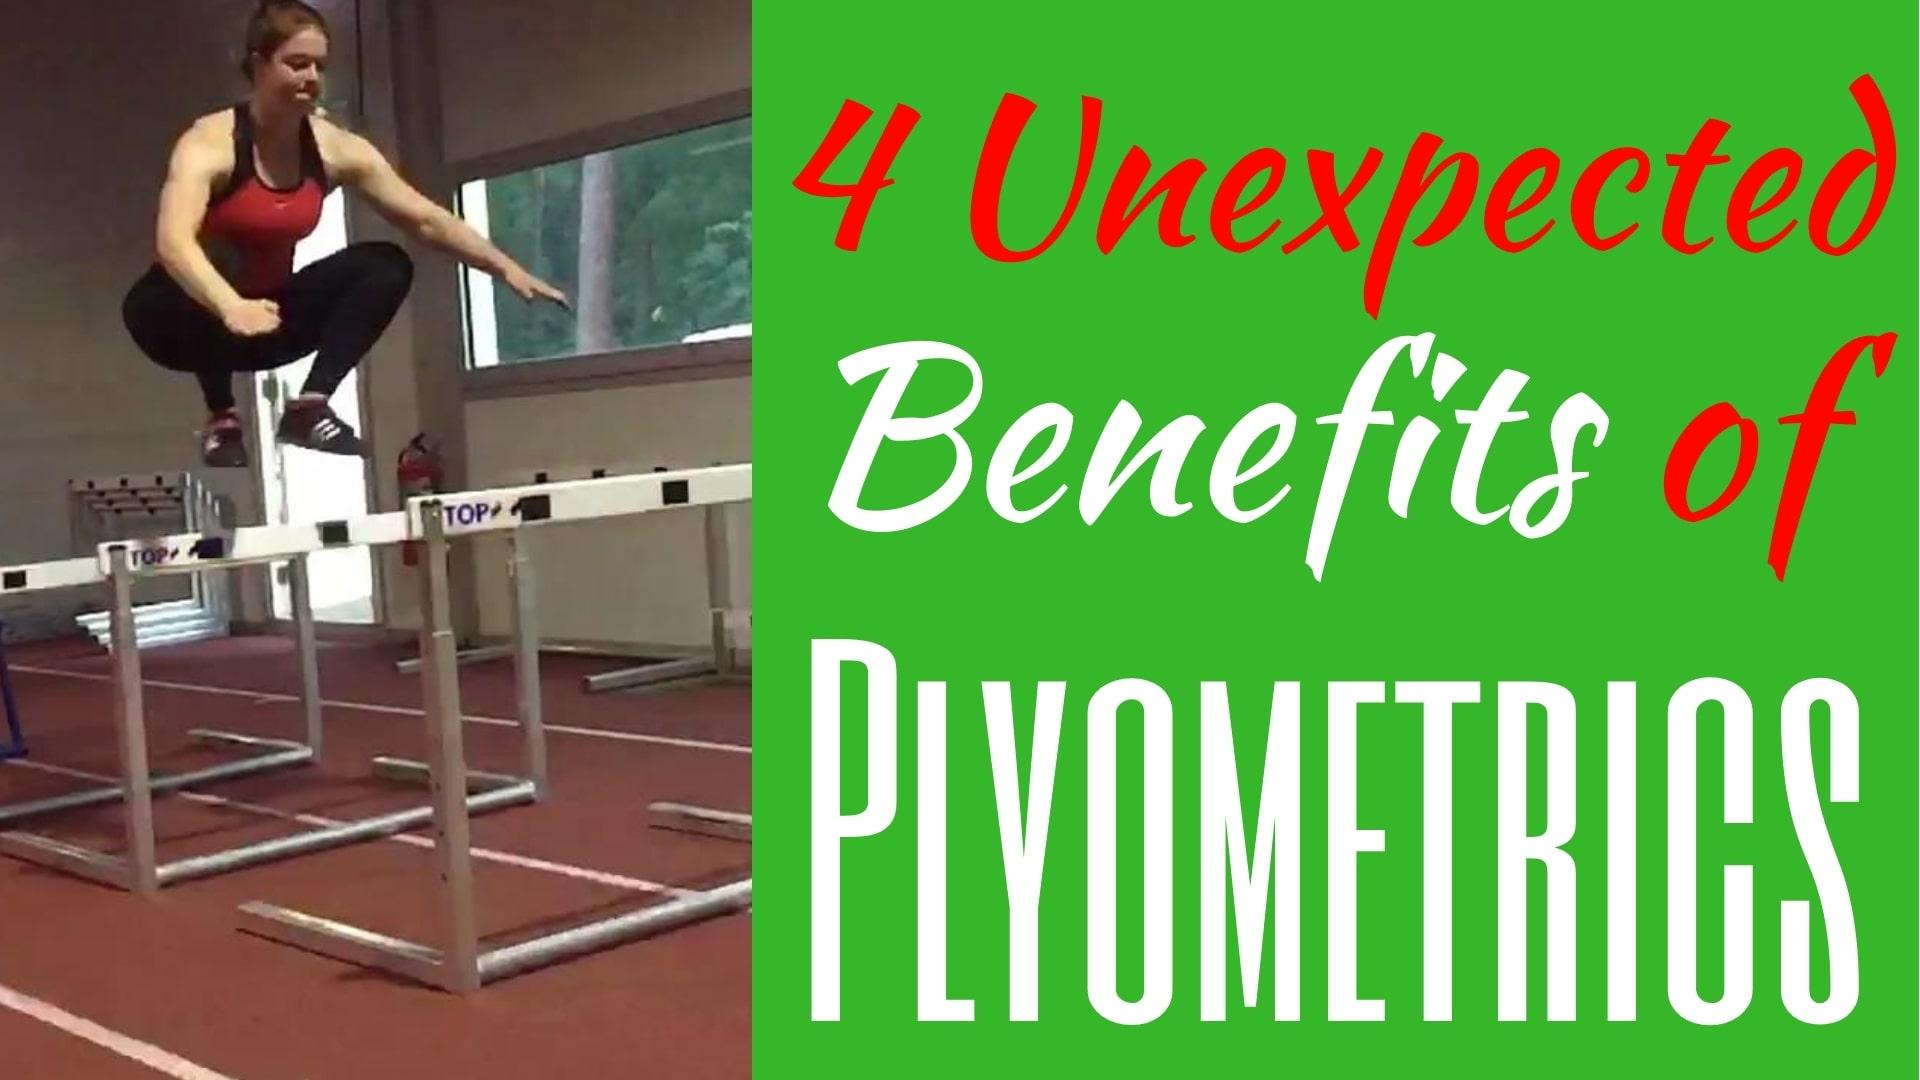 benefits of plyometrics benefits of plyometric training advantages of plyometric training